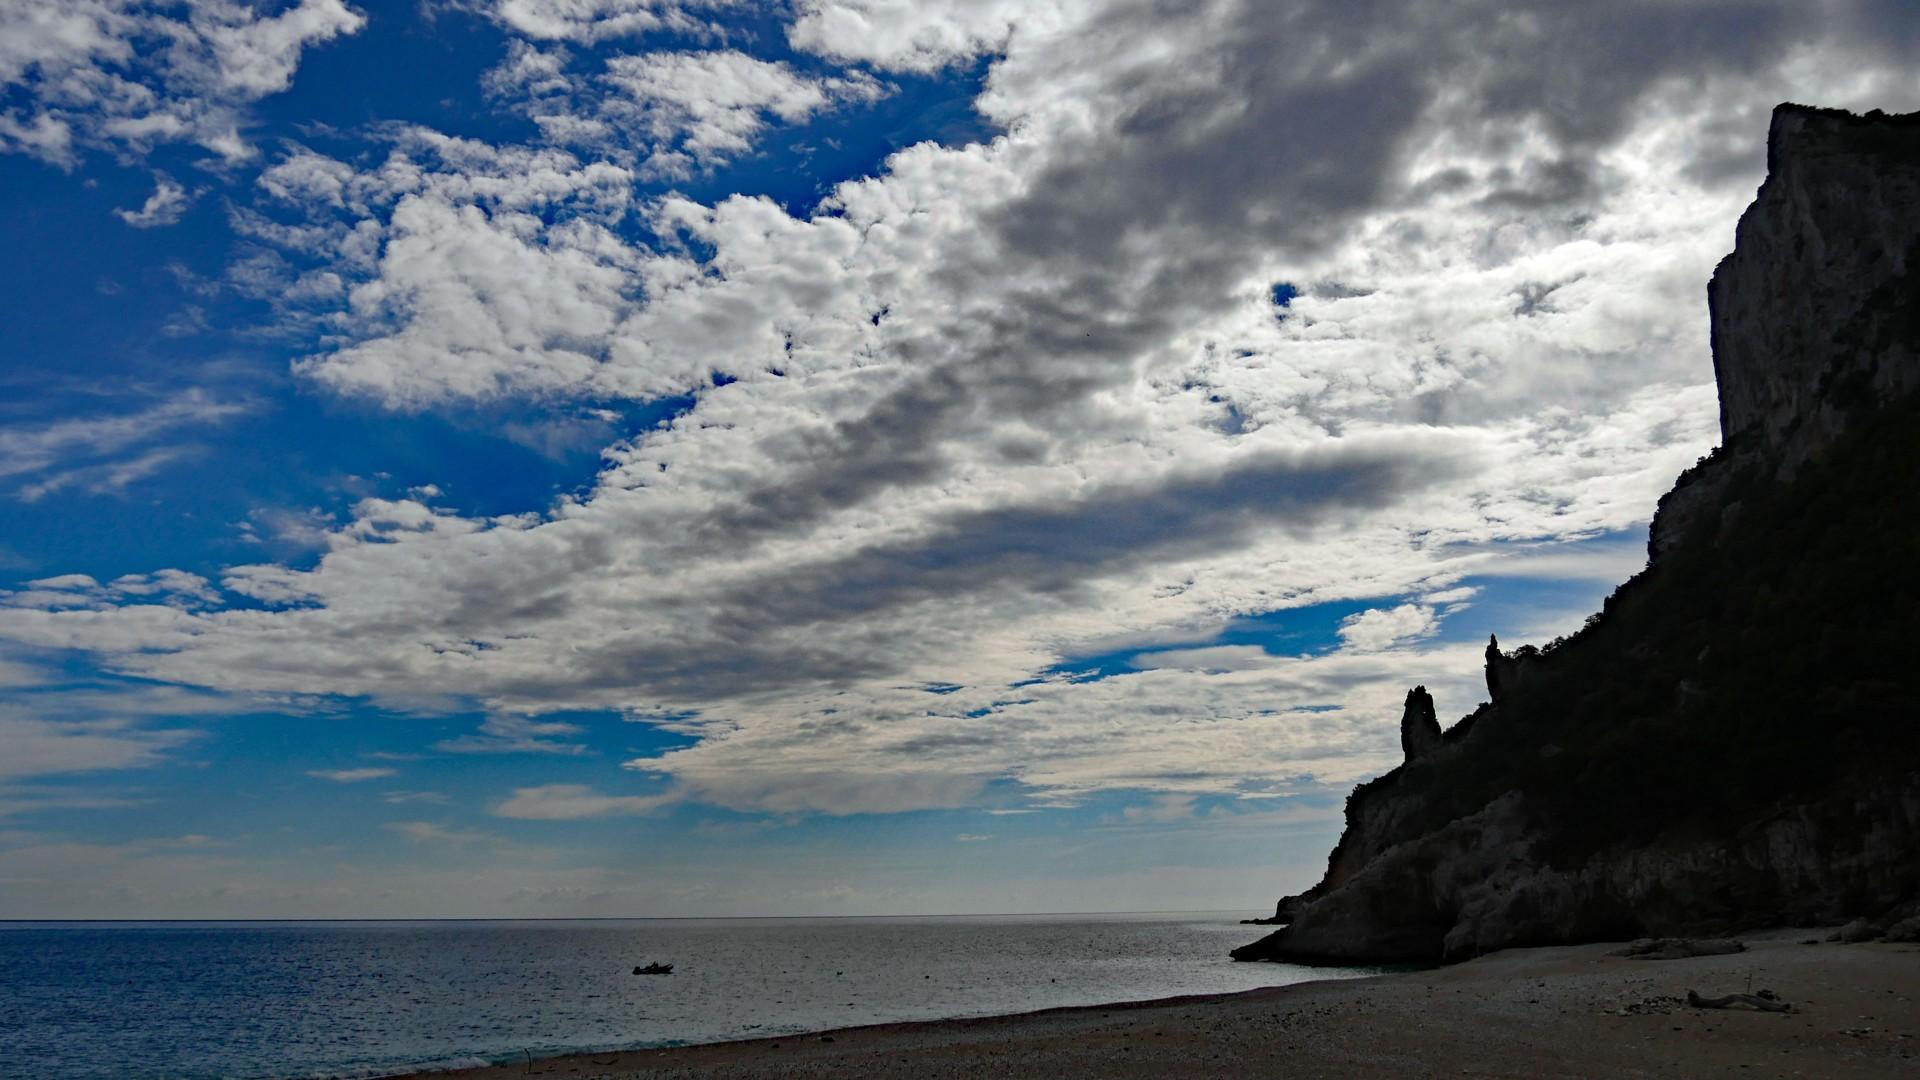 Cala Gonone - sea cliff silhouette .jpg - Sardinia - Wilderness Blue Sea Kayaking - Kayaking